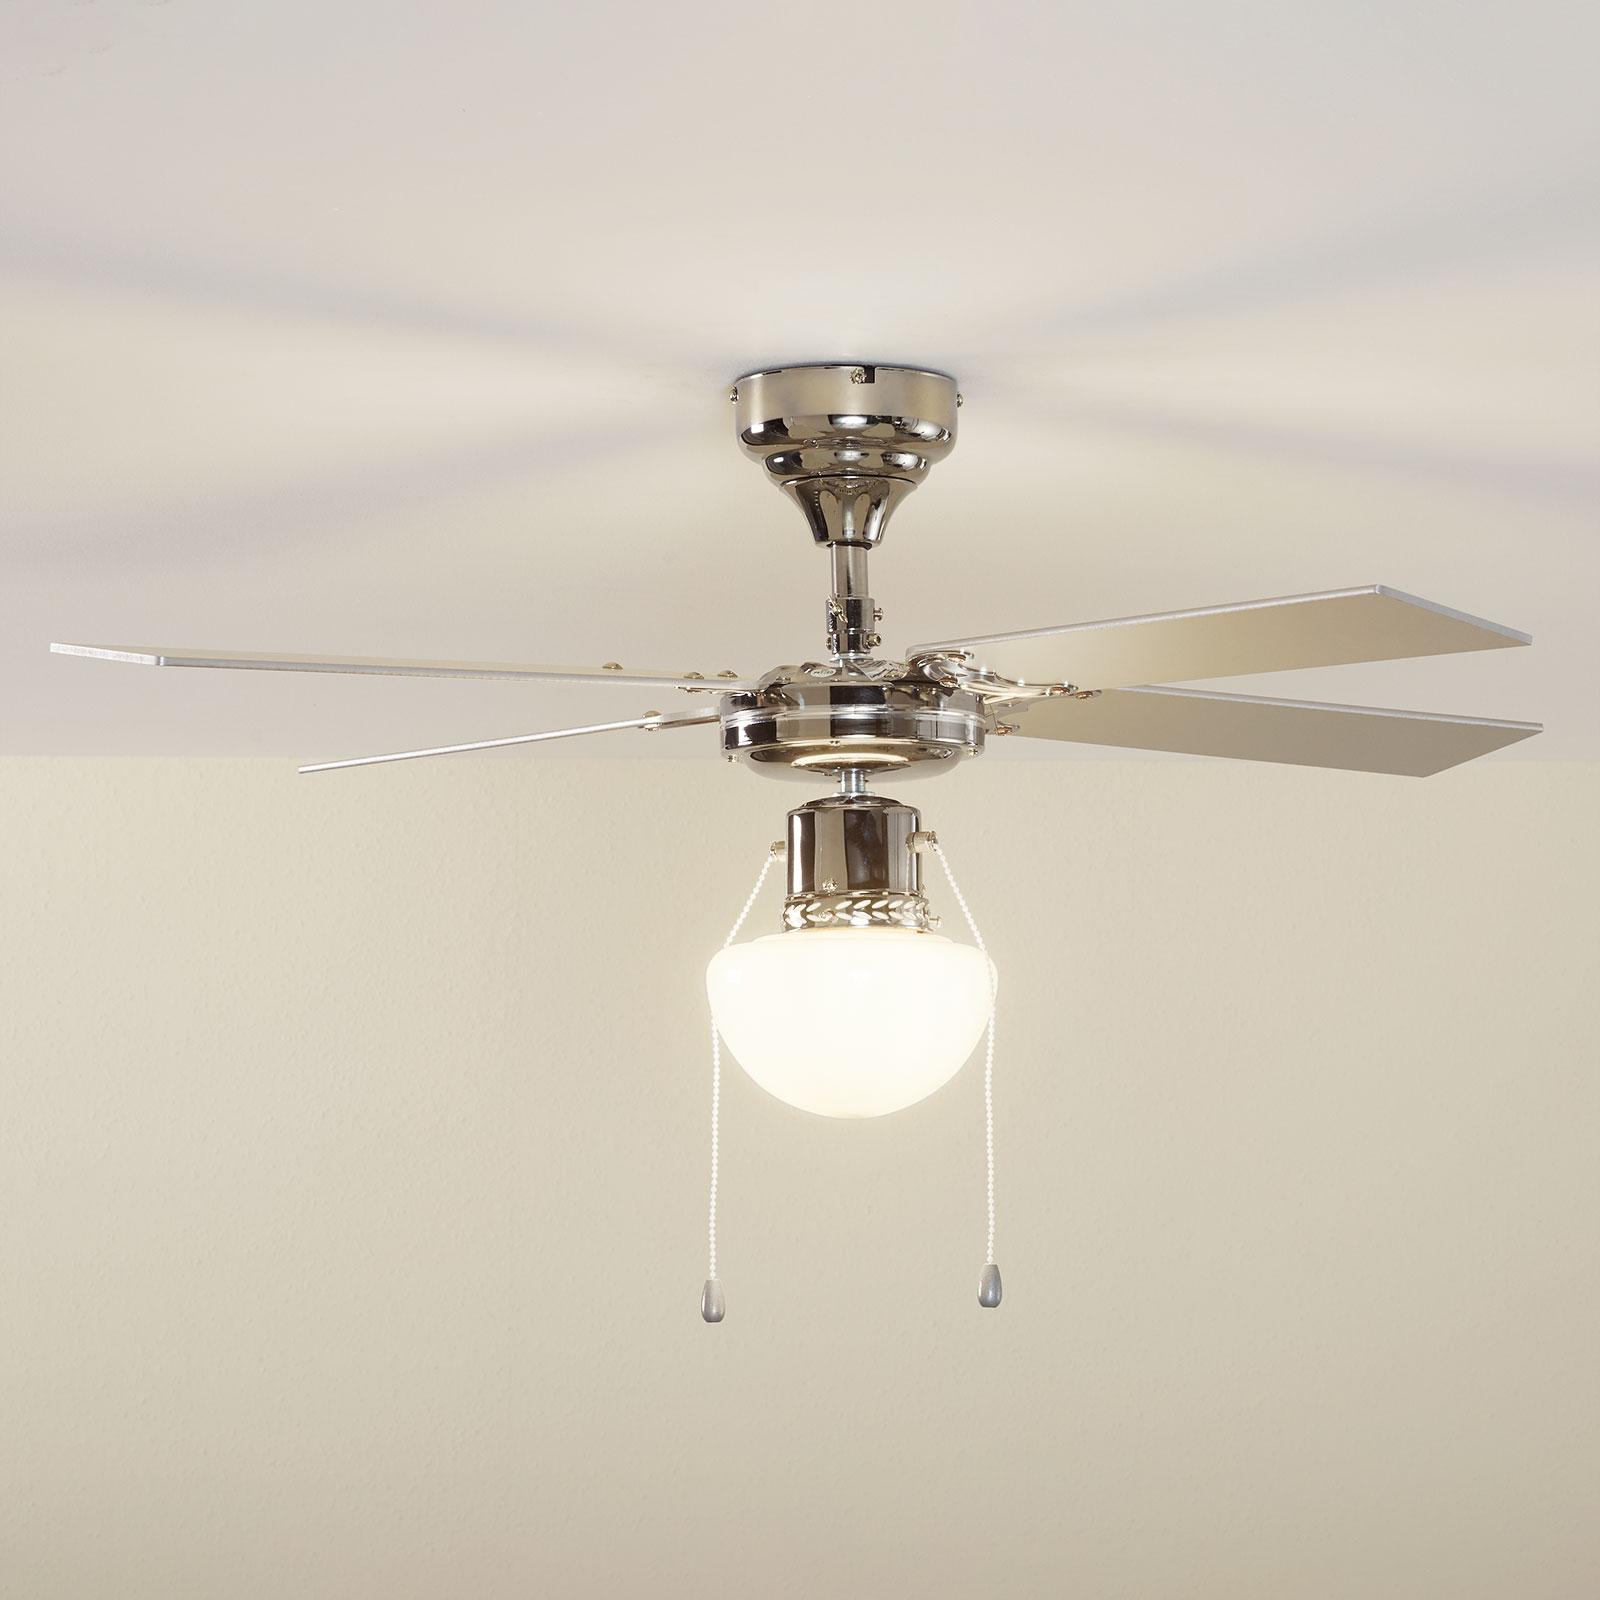 Ventilador de techo Milana con luz, E27